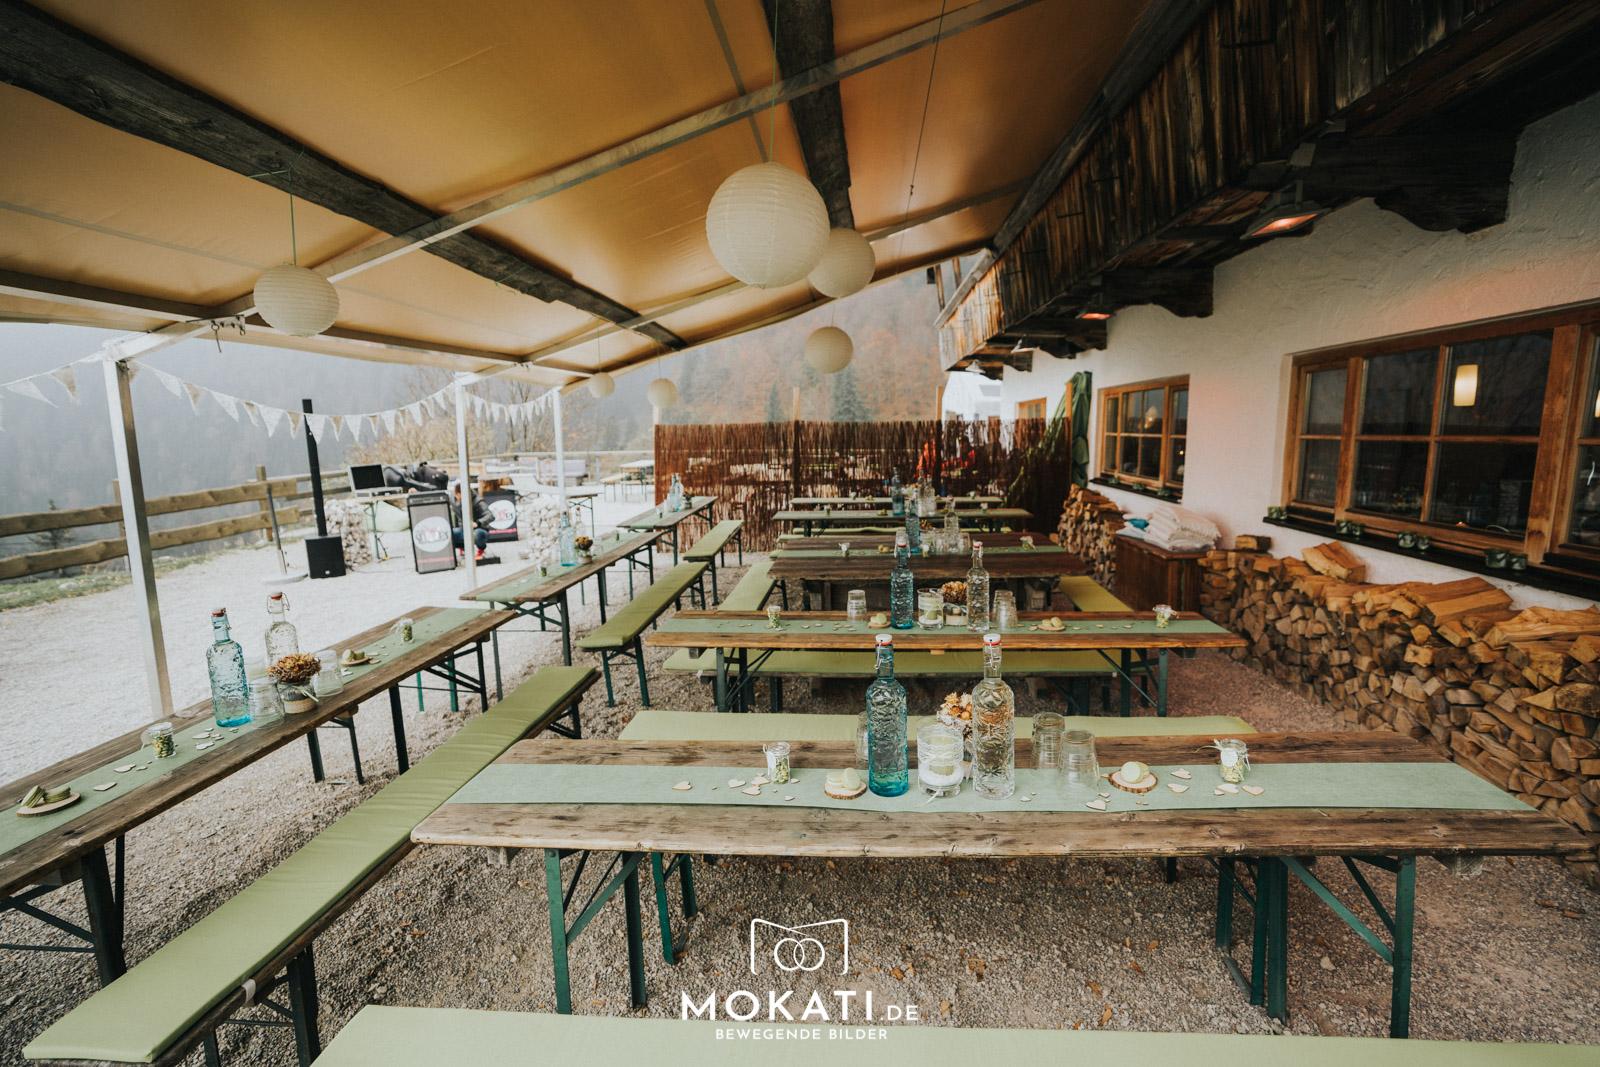 Foto: MOKATI Fotos und Film OHG